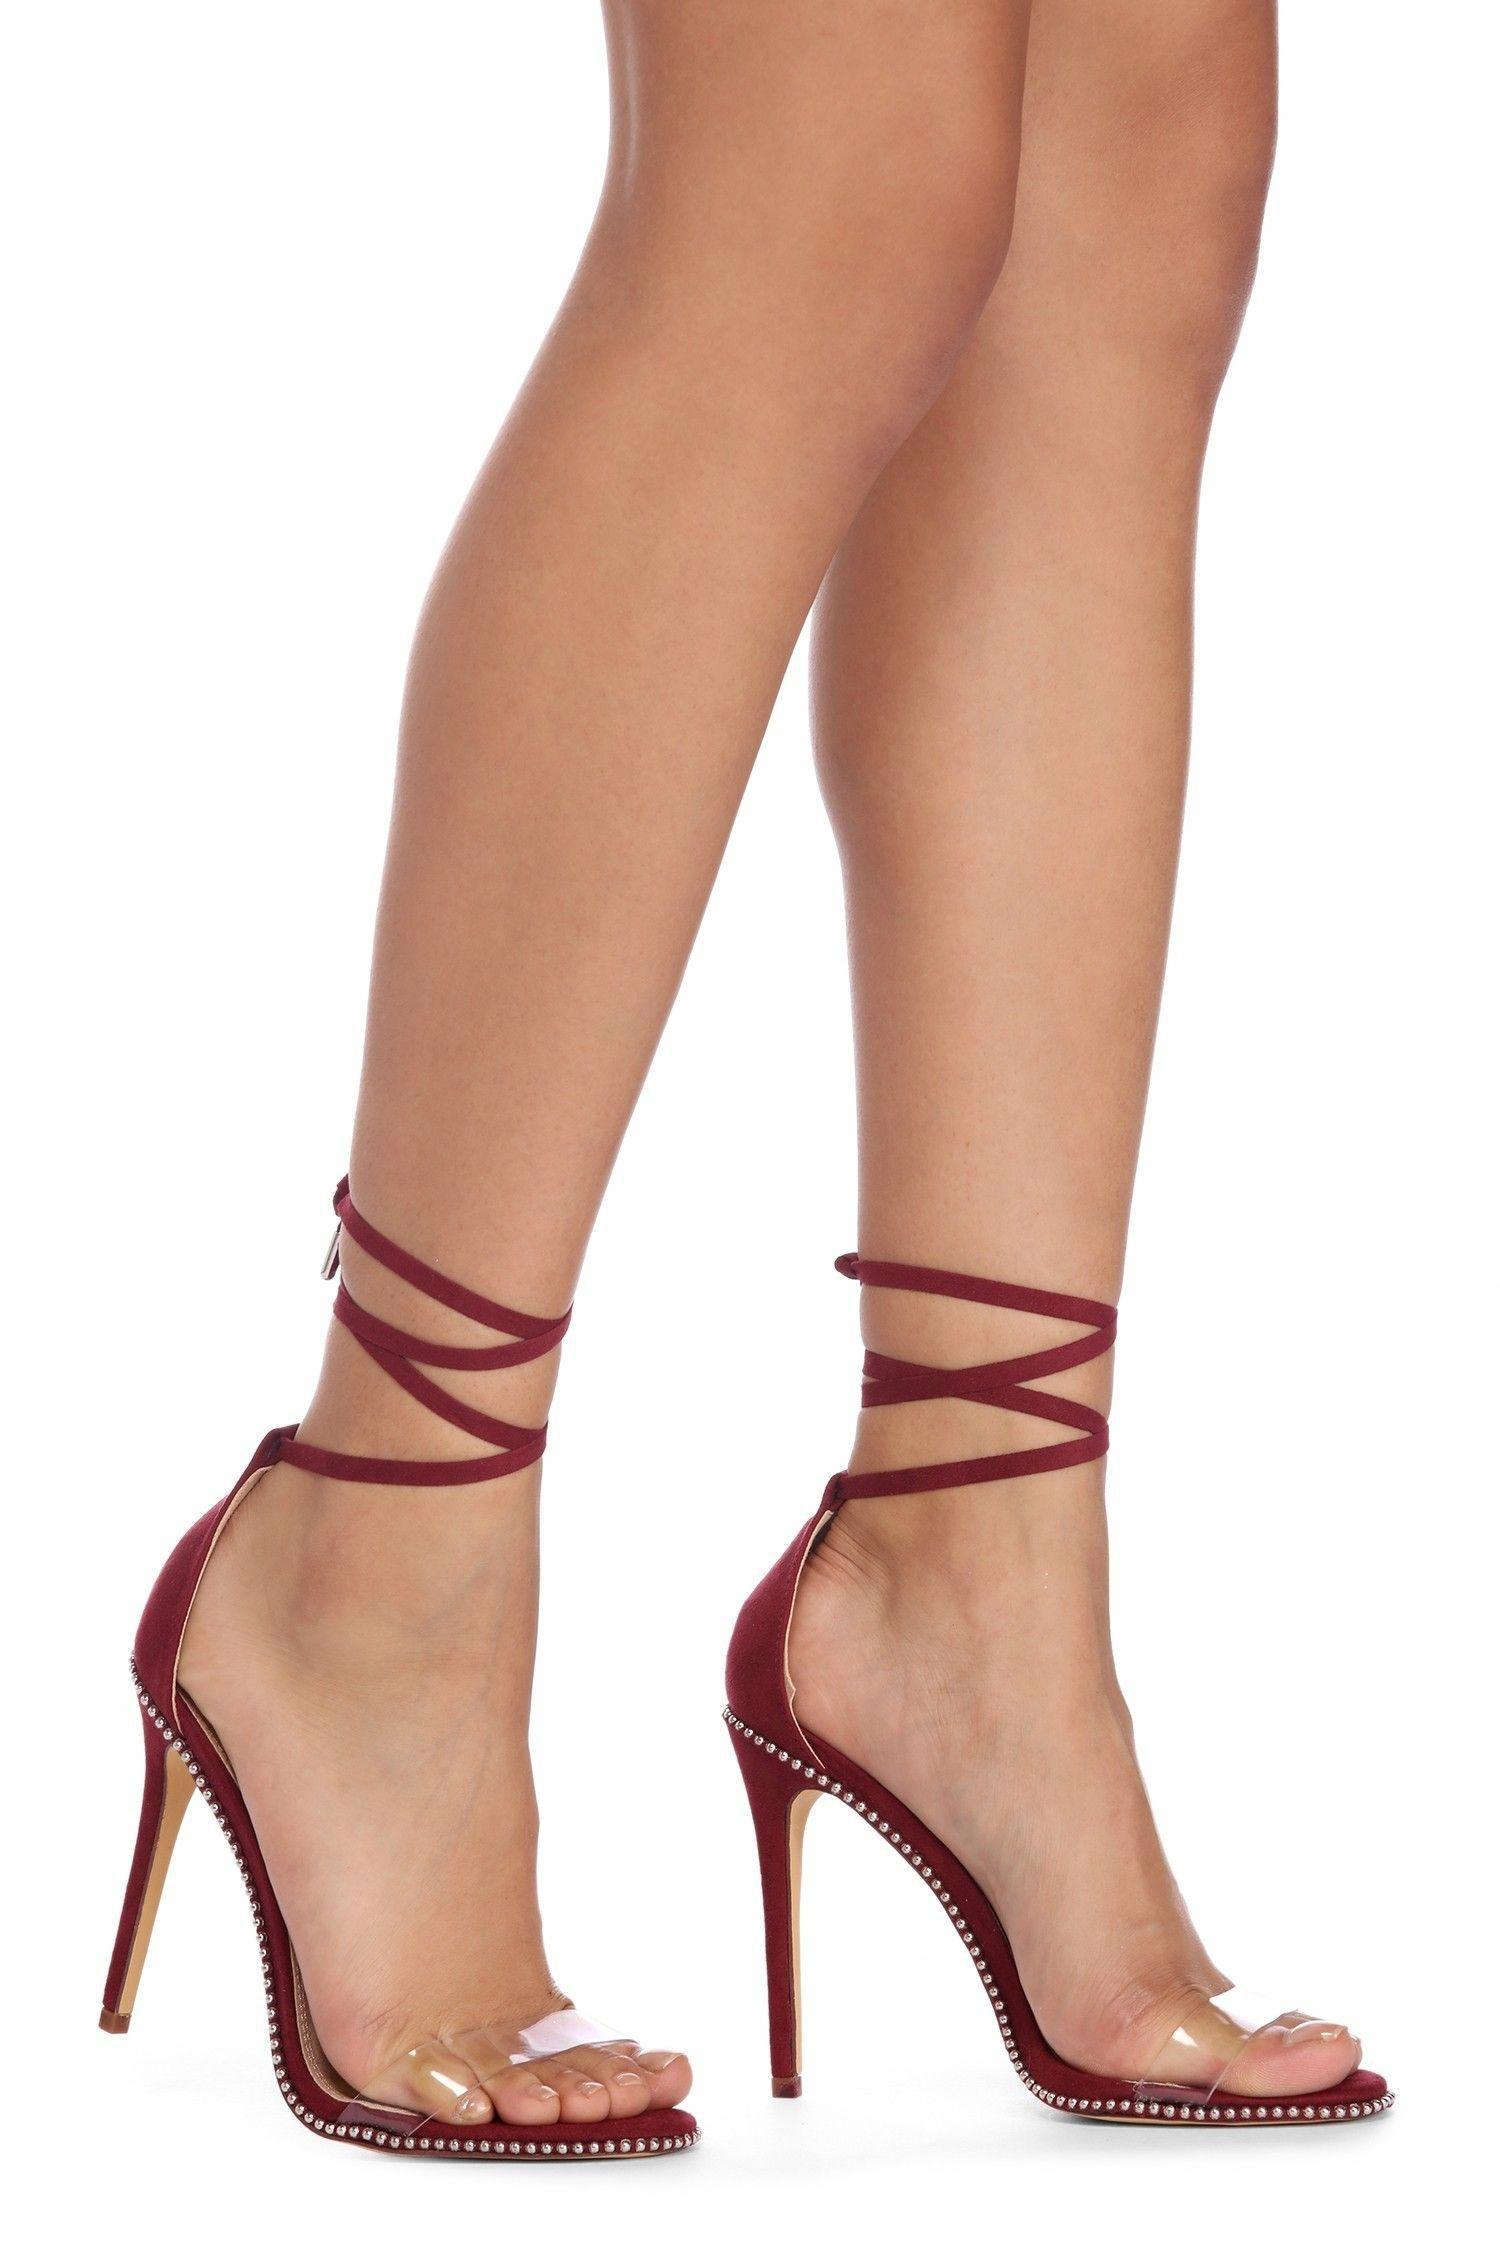 d9030568d7b FINAL SALE- Stunna  Studded Stiletto Heels  Stilettoheels